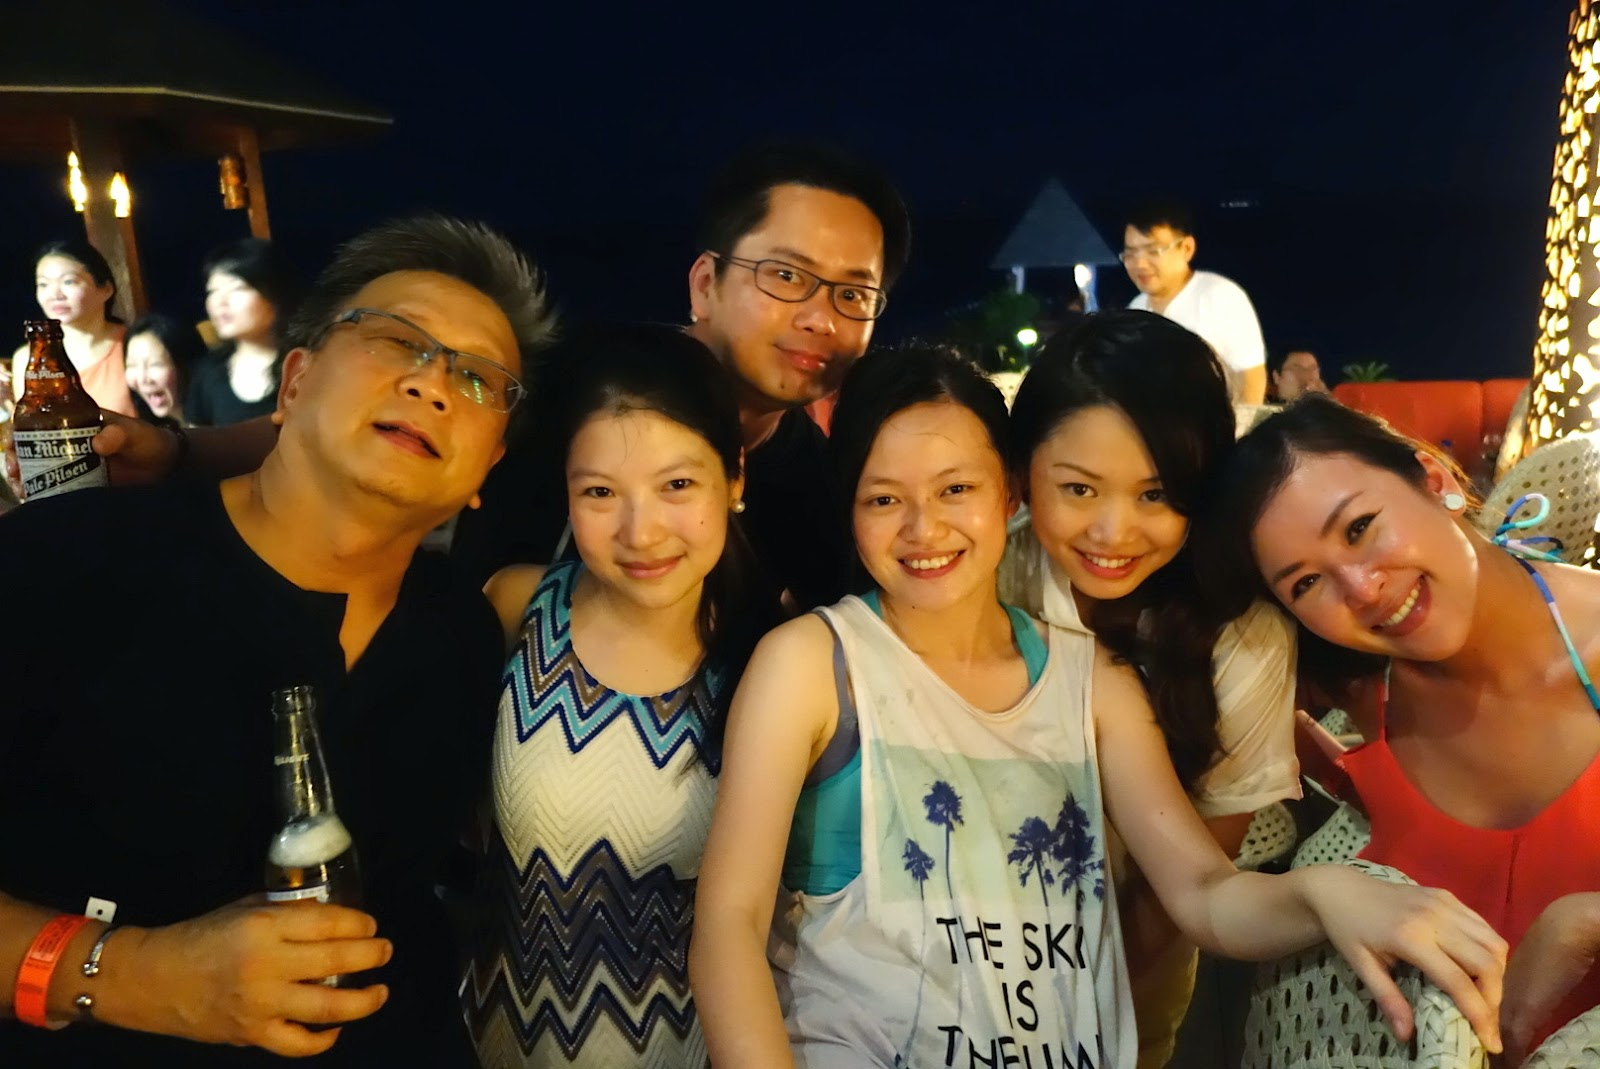 nightlife girls philippines - photo #20